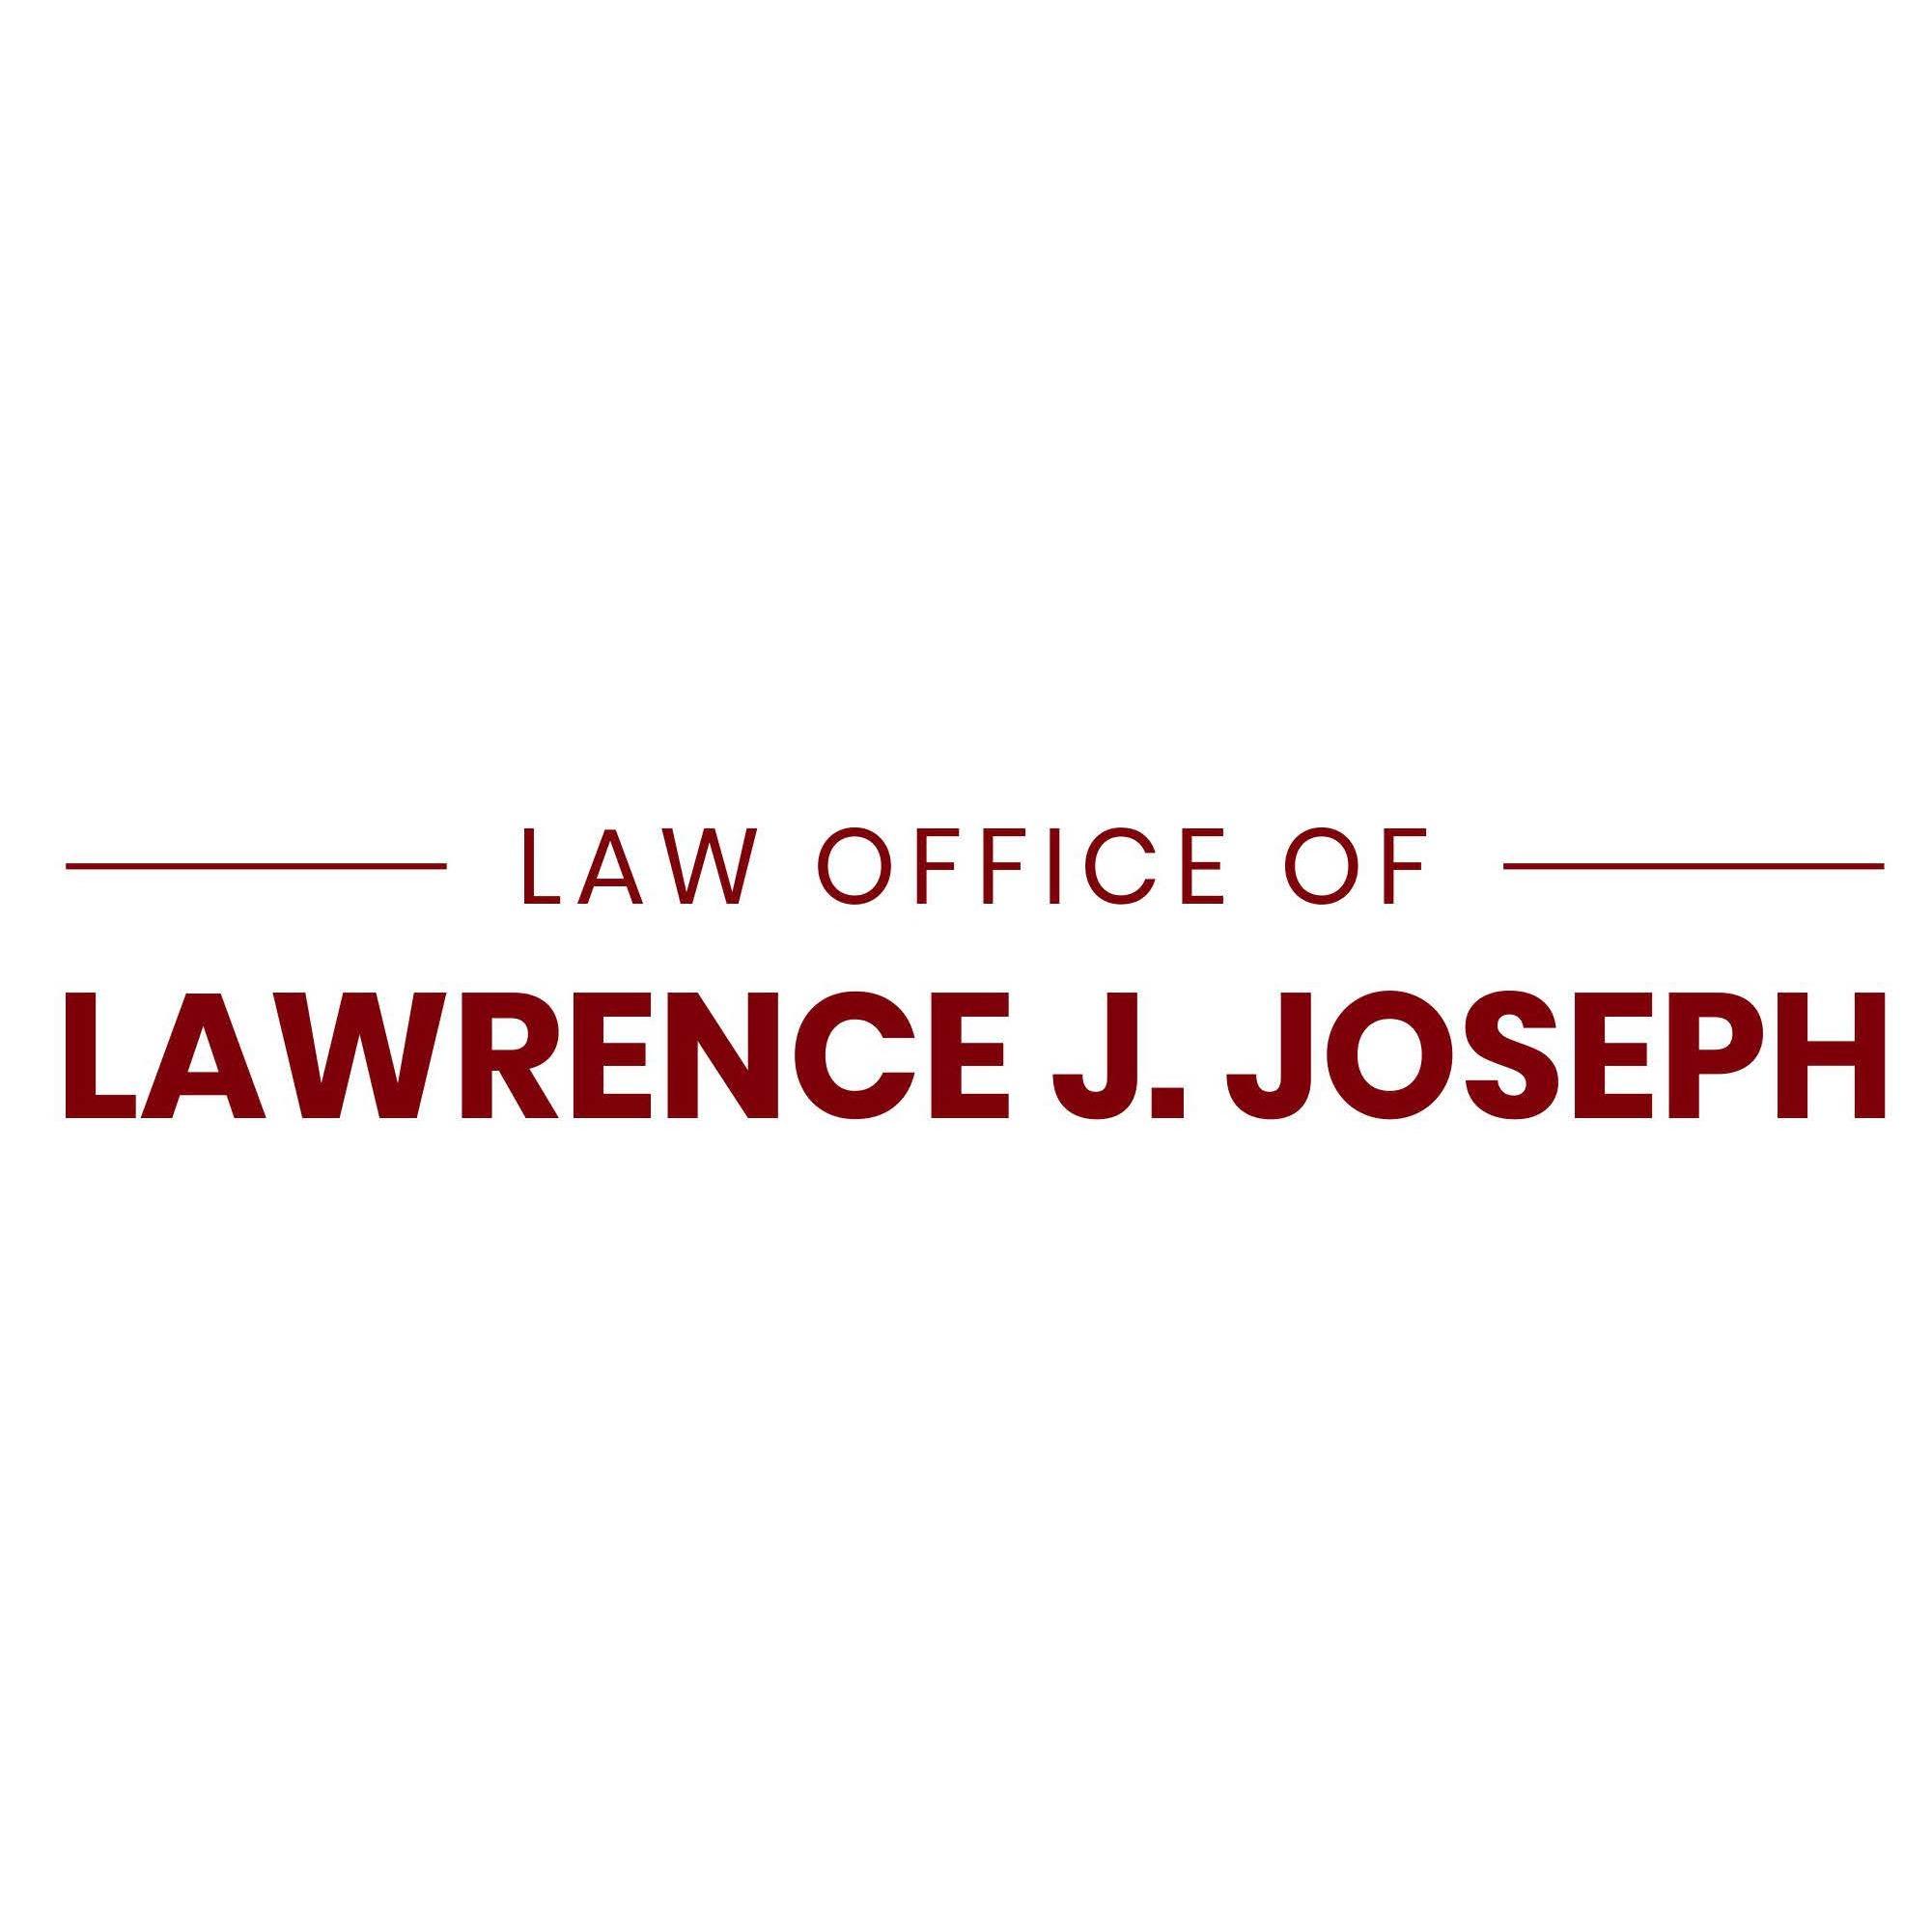 Law Office of Lawrence J. Joseph